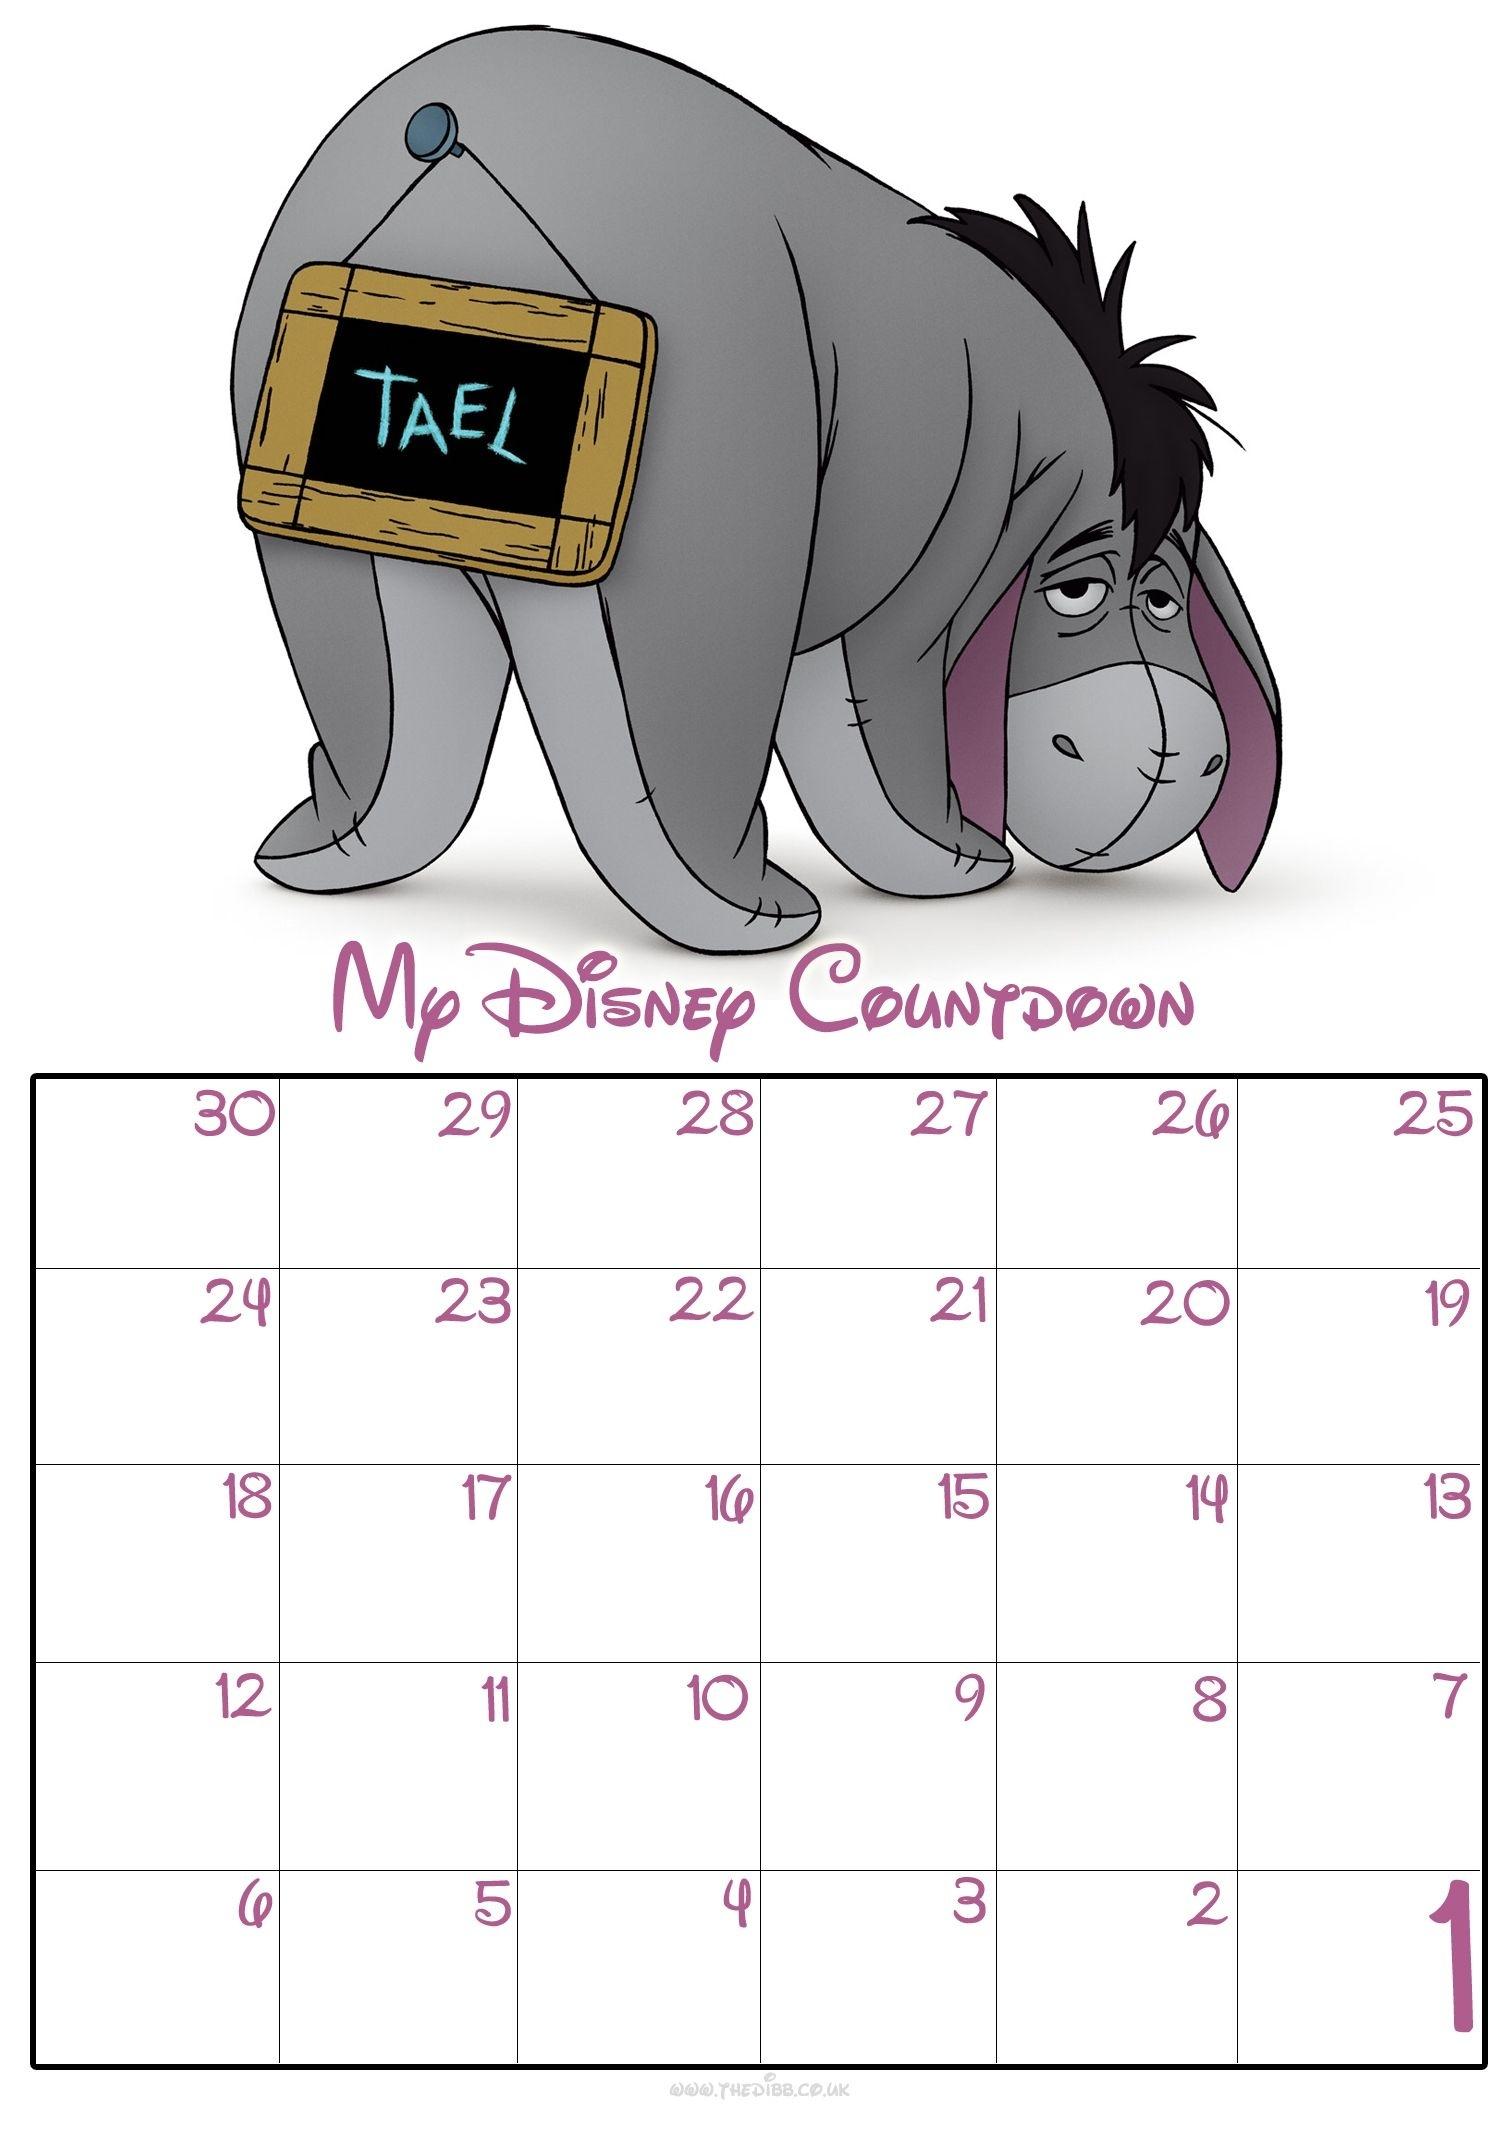 30 Day Disney Countdown Calendars   Ideas For Home Disney Countdown Calendar App